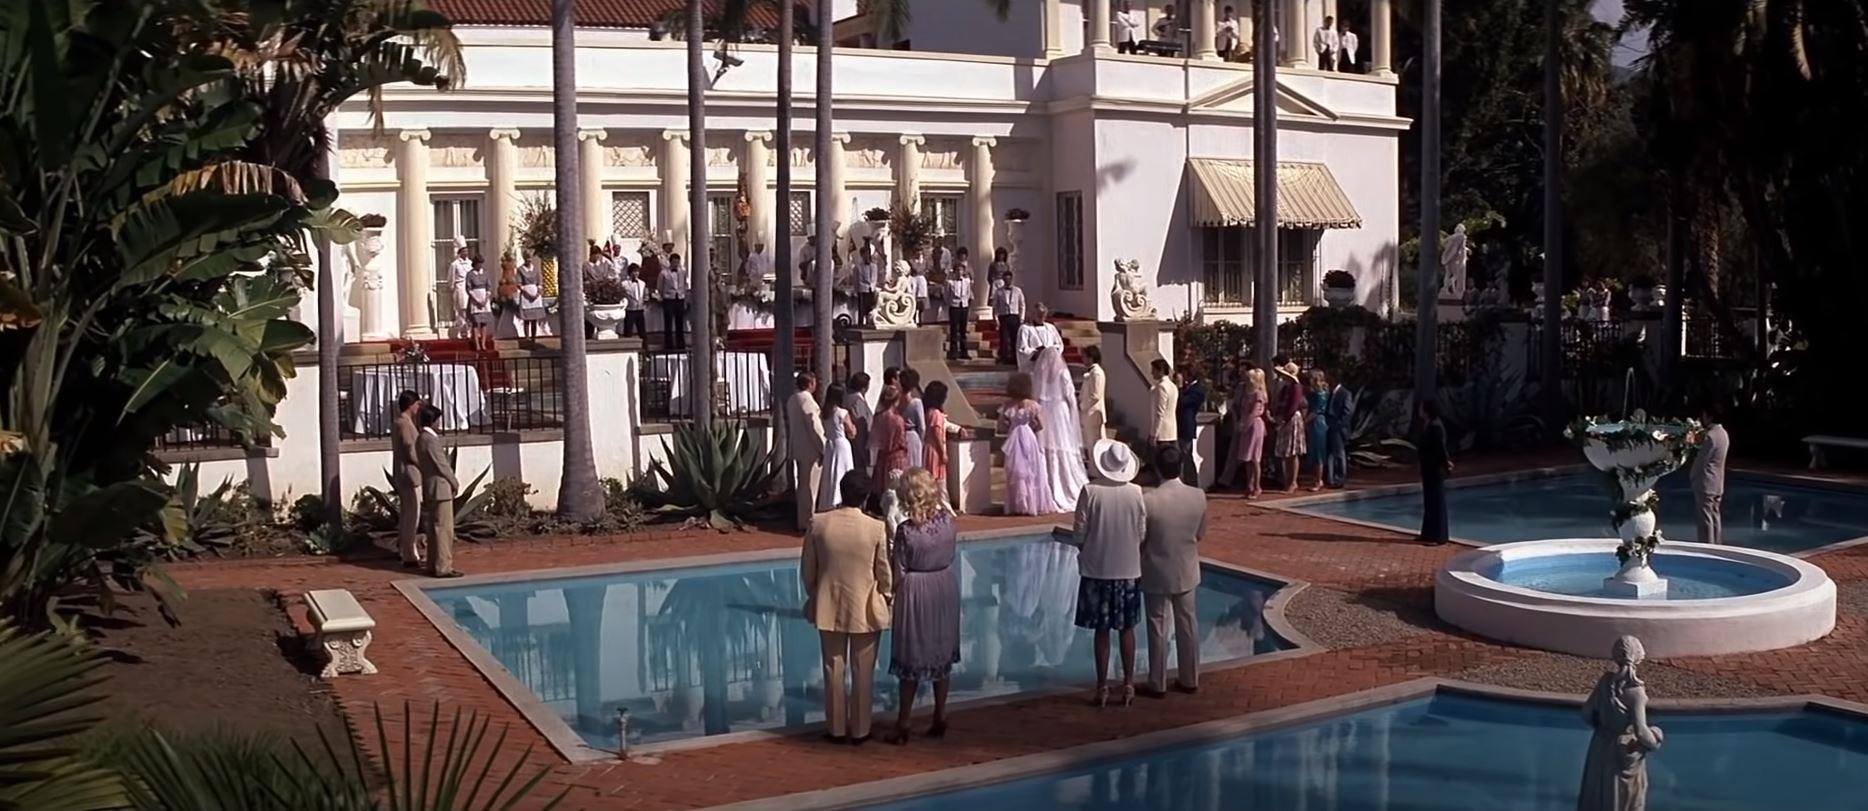 Scarface wedding